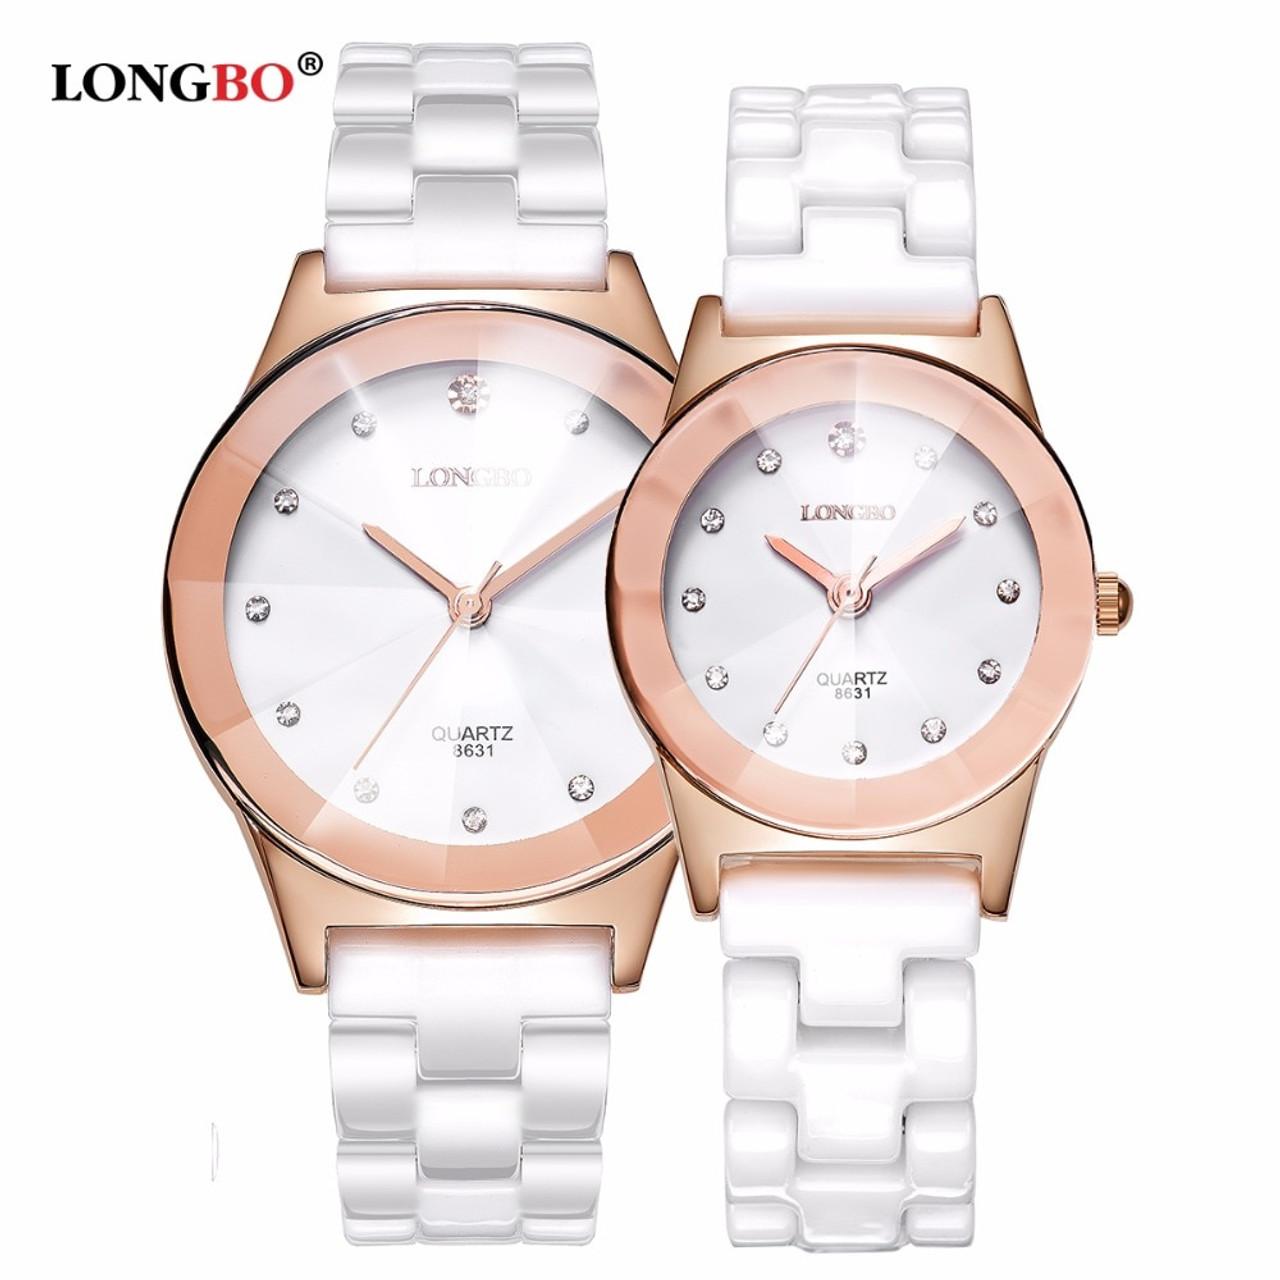 554284e8d23 ... 2018 LONGBO Top Brand Fashion Quartz White Ceramic Lovers Watches  Luxury Casual Unique Ladies Dress Wristwatch ...